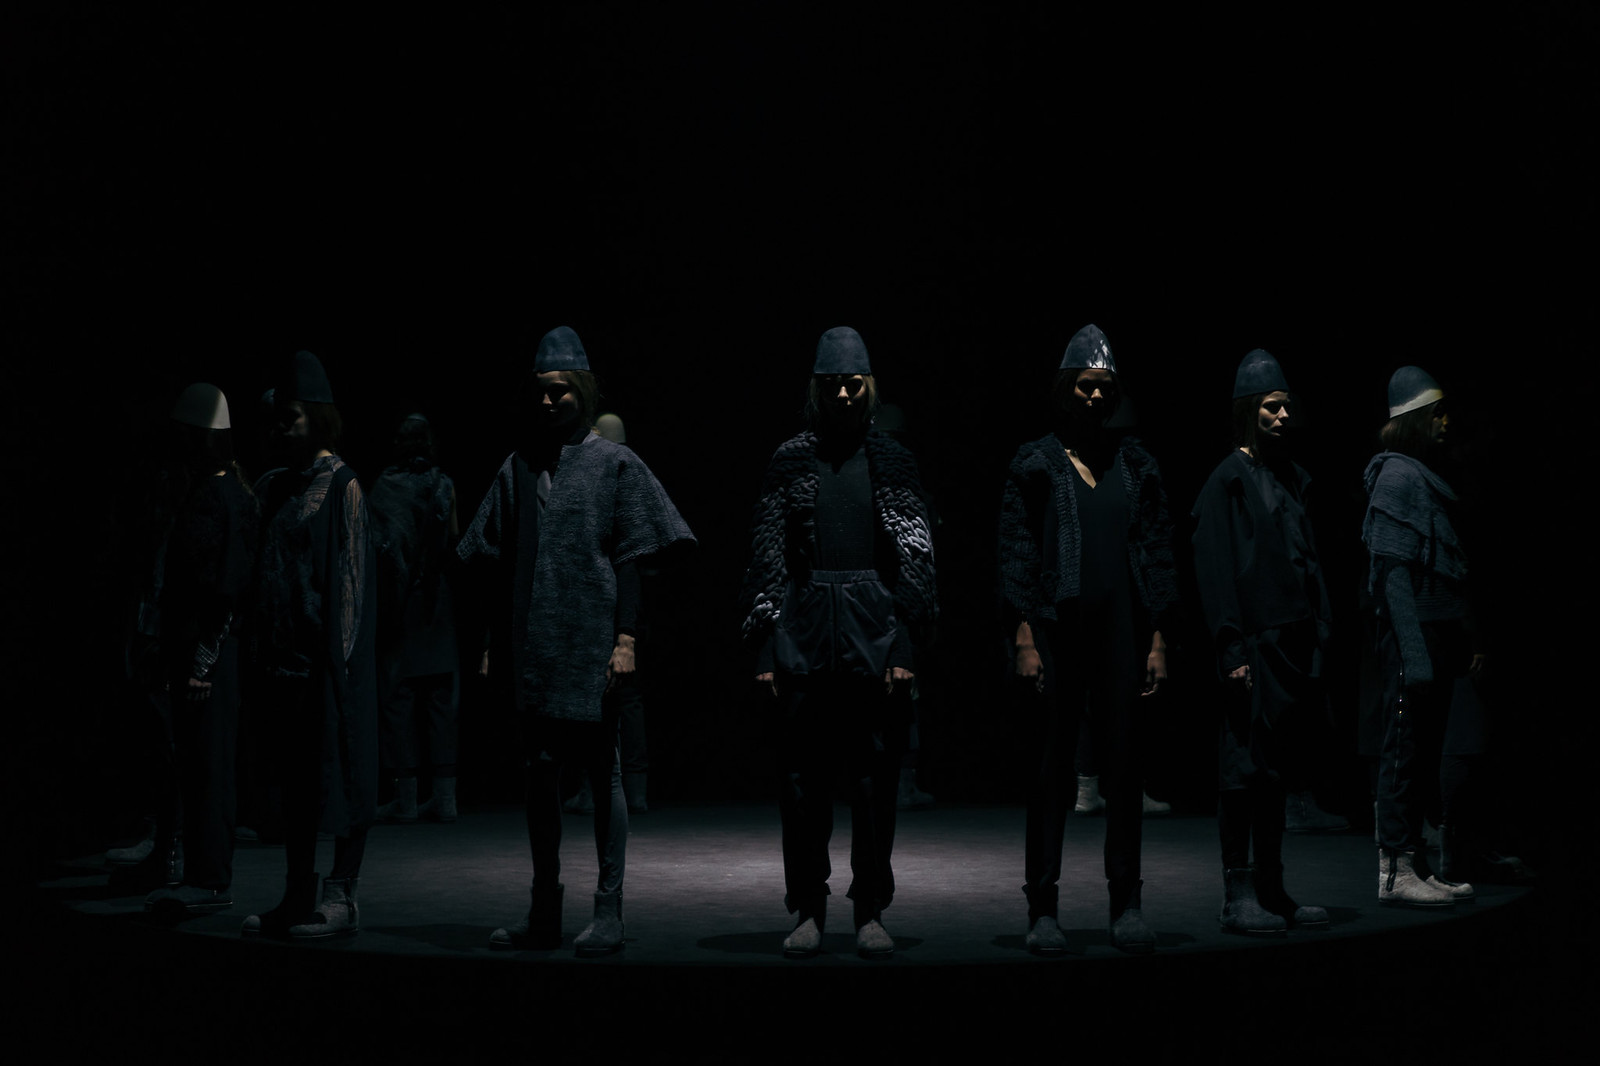 Jessie Chanes - Seams for a desire - 080 Bacelona Fashion #080bcnfasion -31